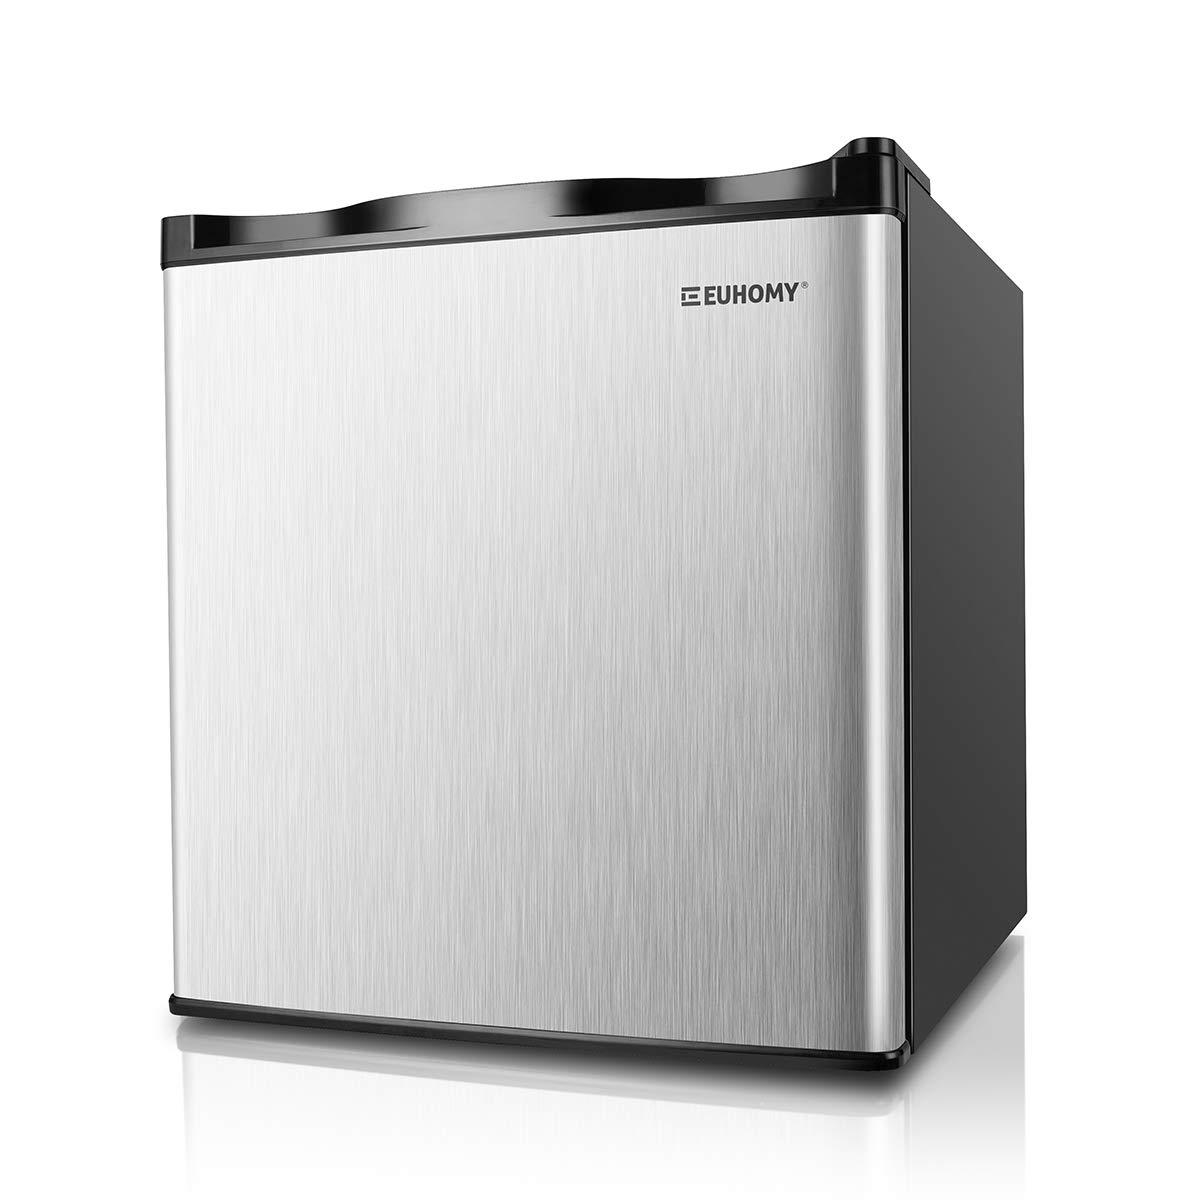 Euhomy Compact Upright Freezer, Energy Star 1.1 Cubic Feet Single door countertop mini freezer with Reversible Stainless Steel Door. by E EUHOMY